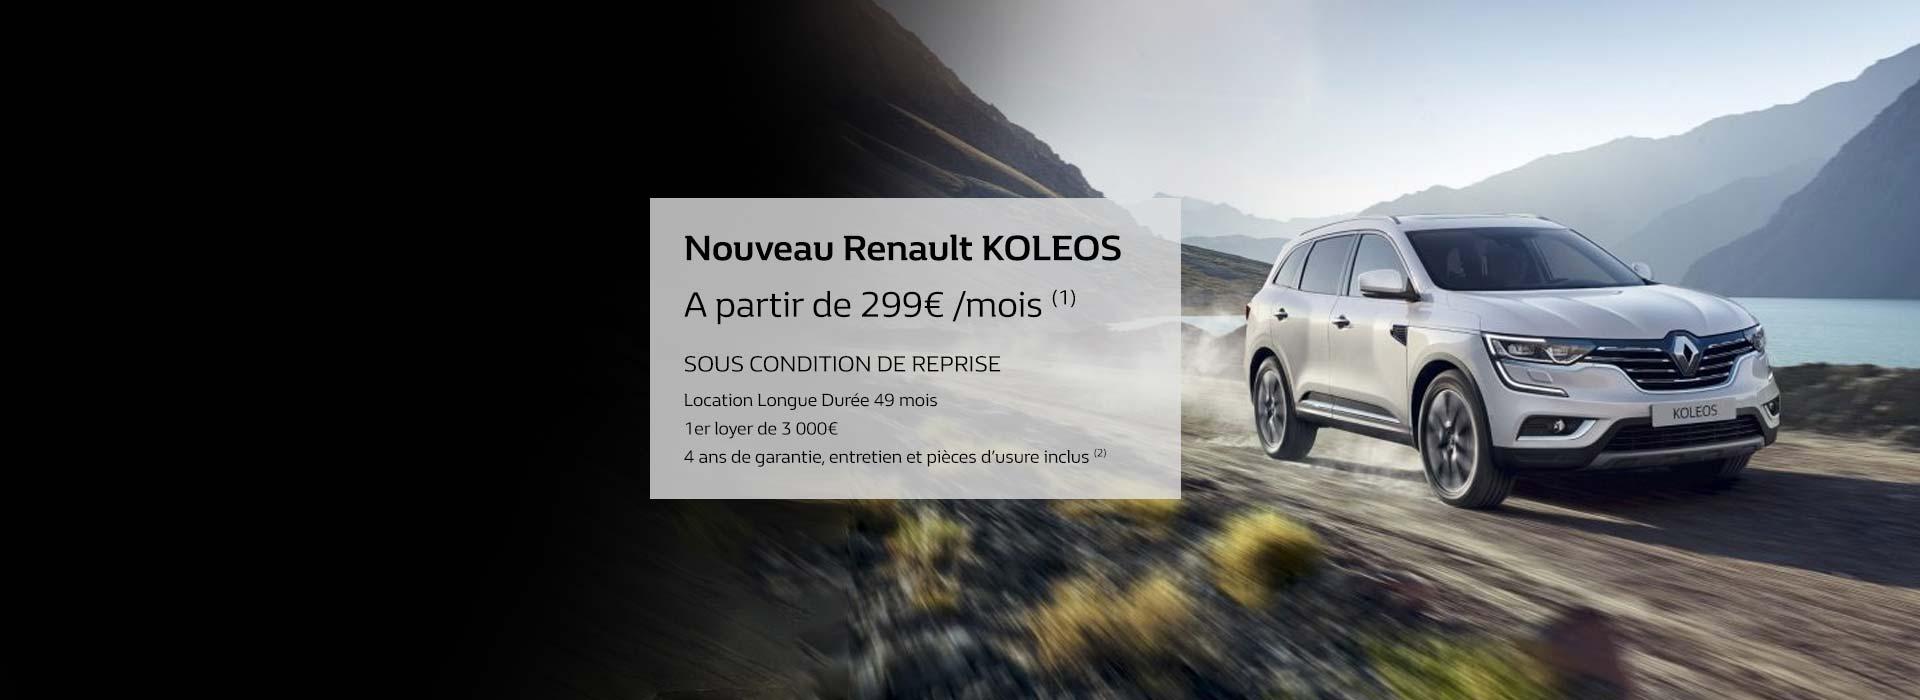 Renault KOLEOS